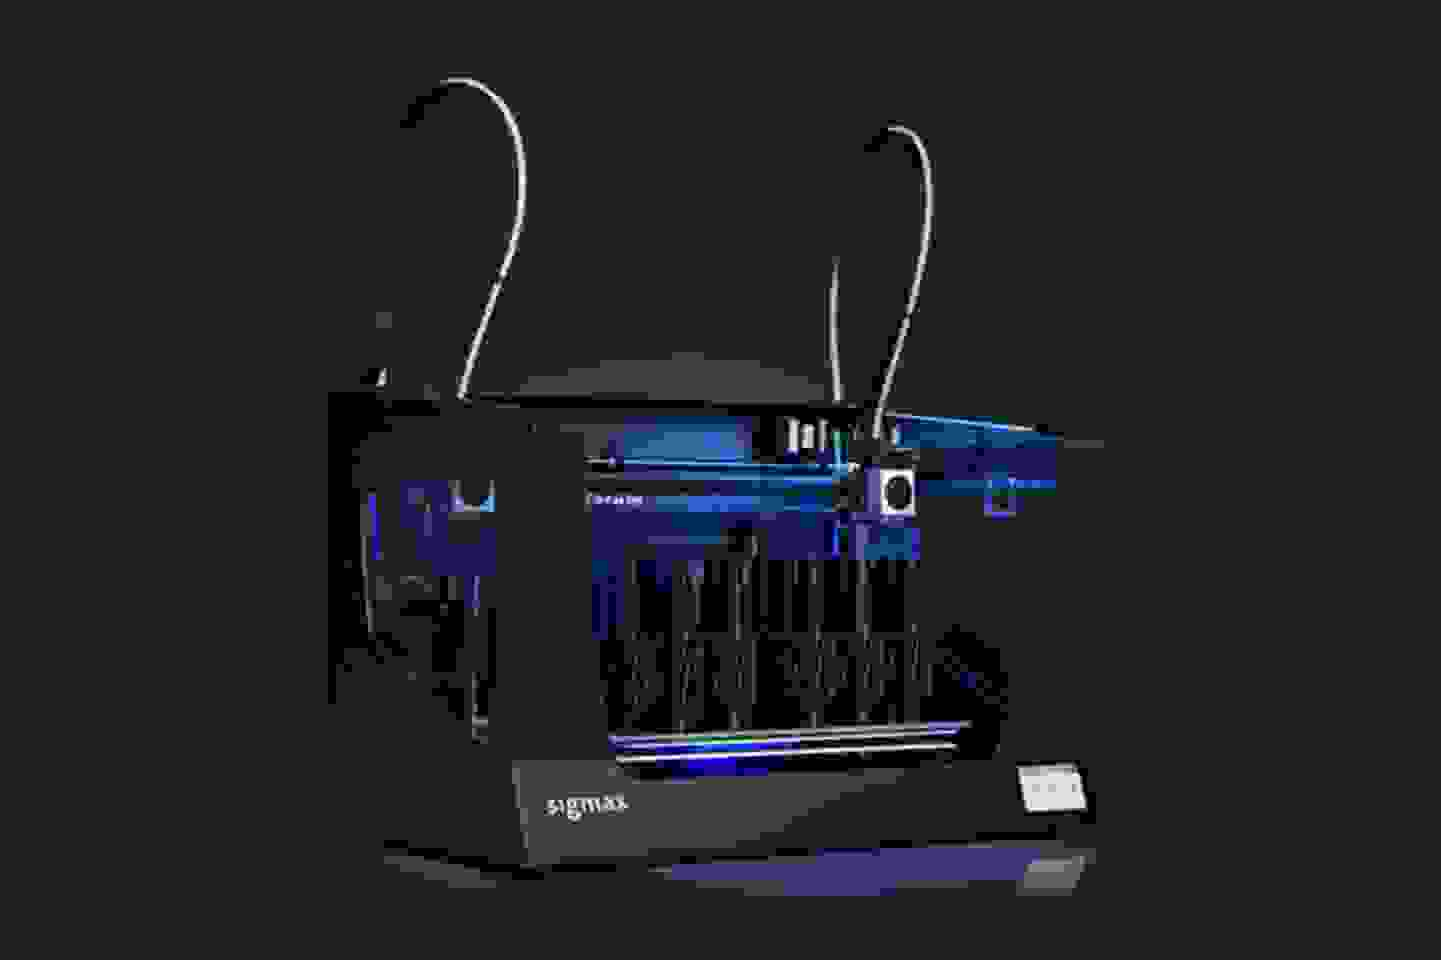 Sigmax R19